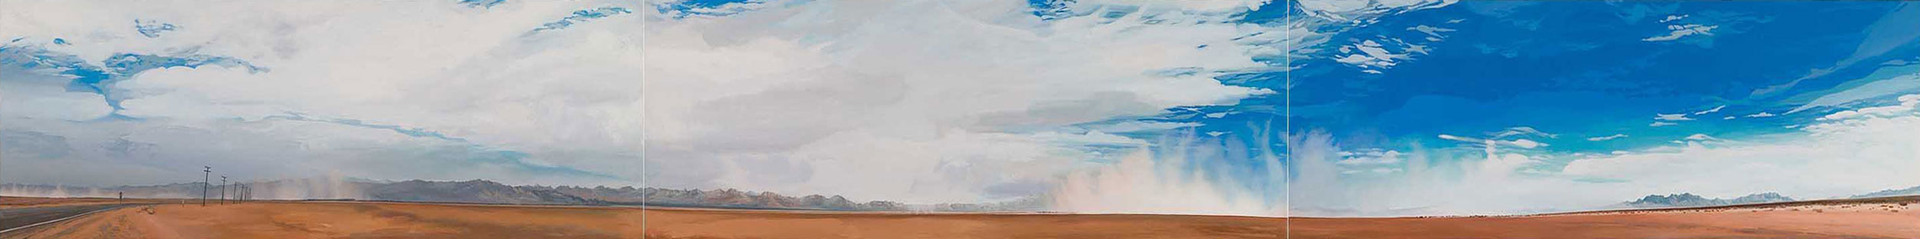 "Sandstorm, Bristol Dry Lake  tryptich  22""x174""  acrylic on canvas   2008"